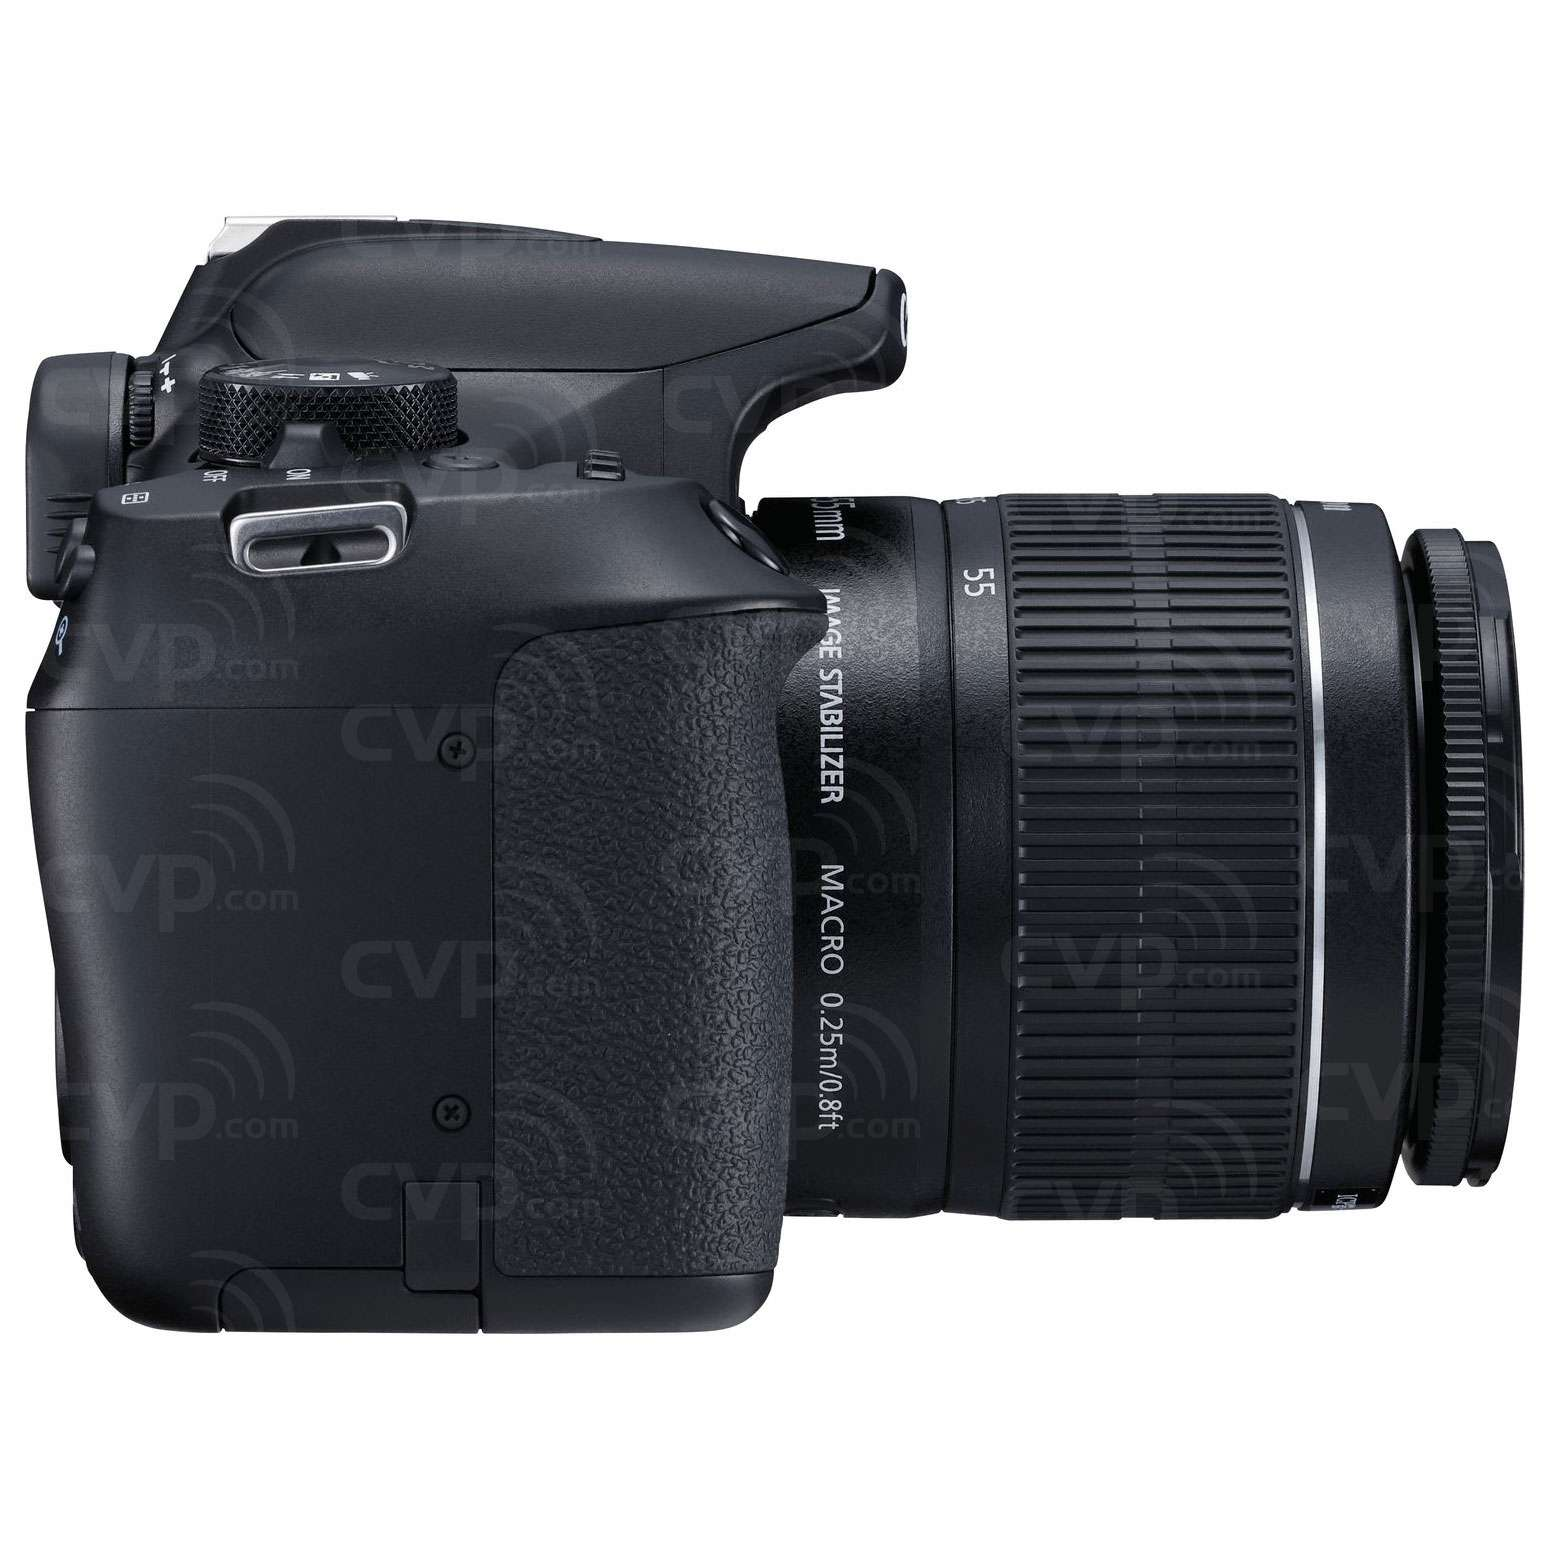 Canon EOS 1300D Power Kit